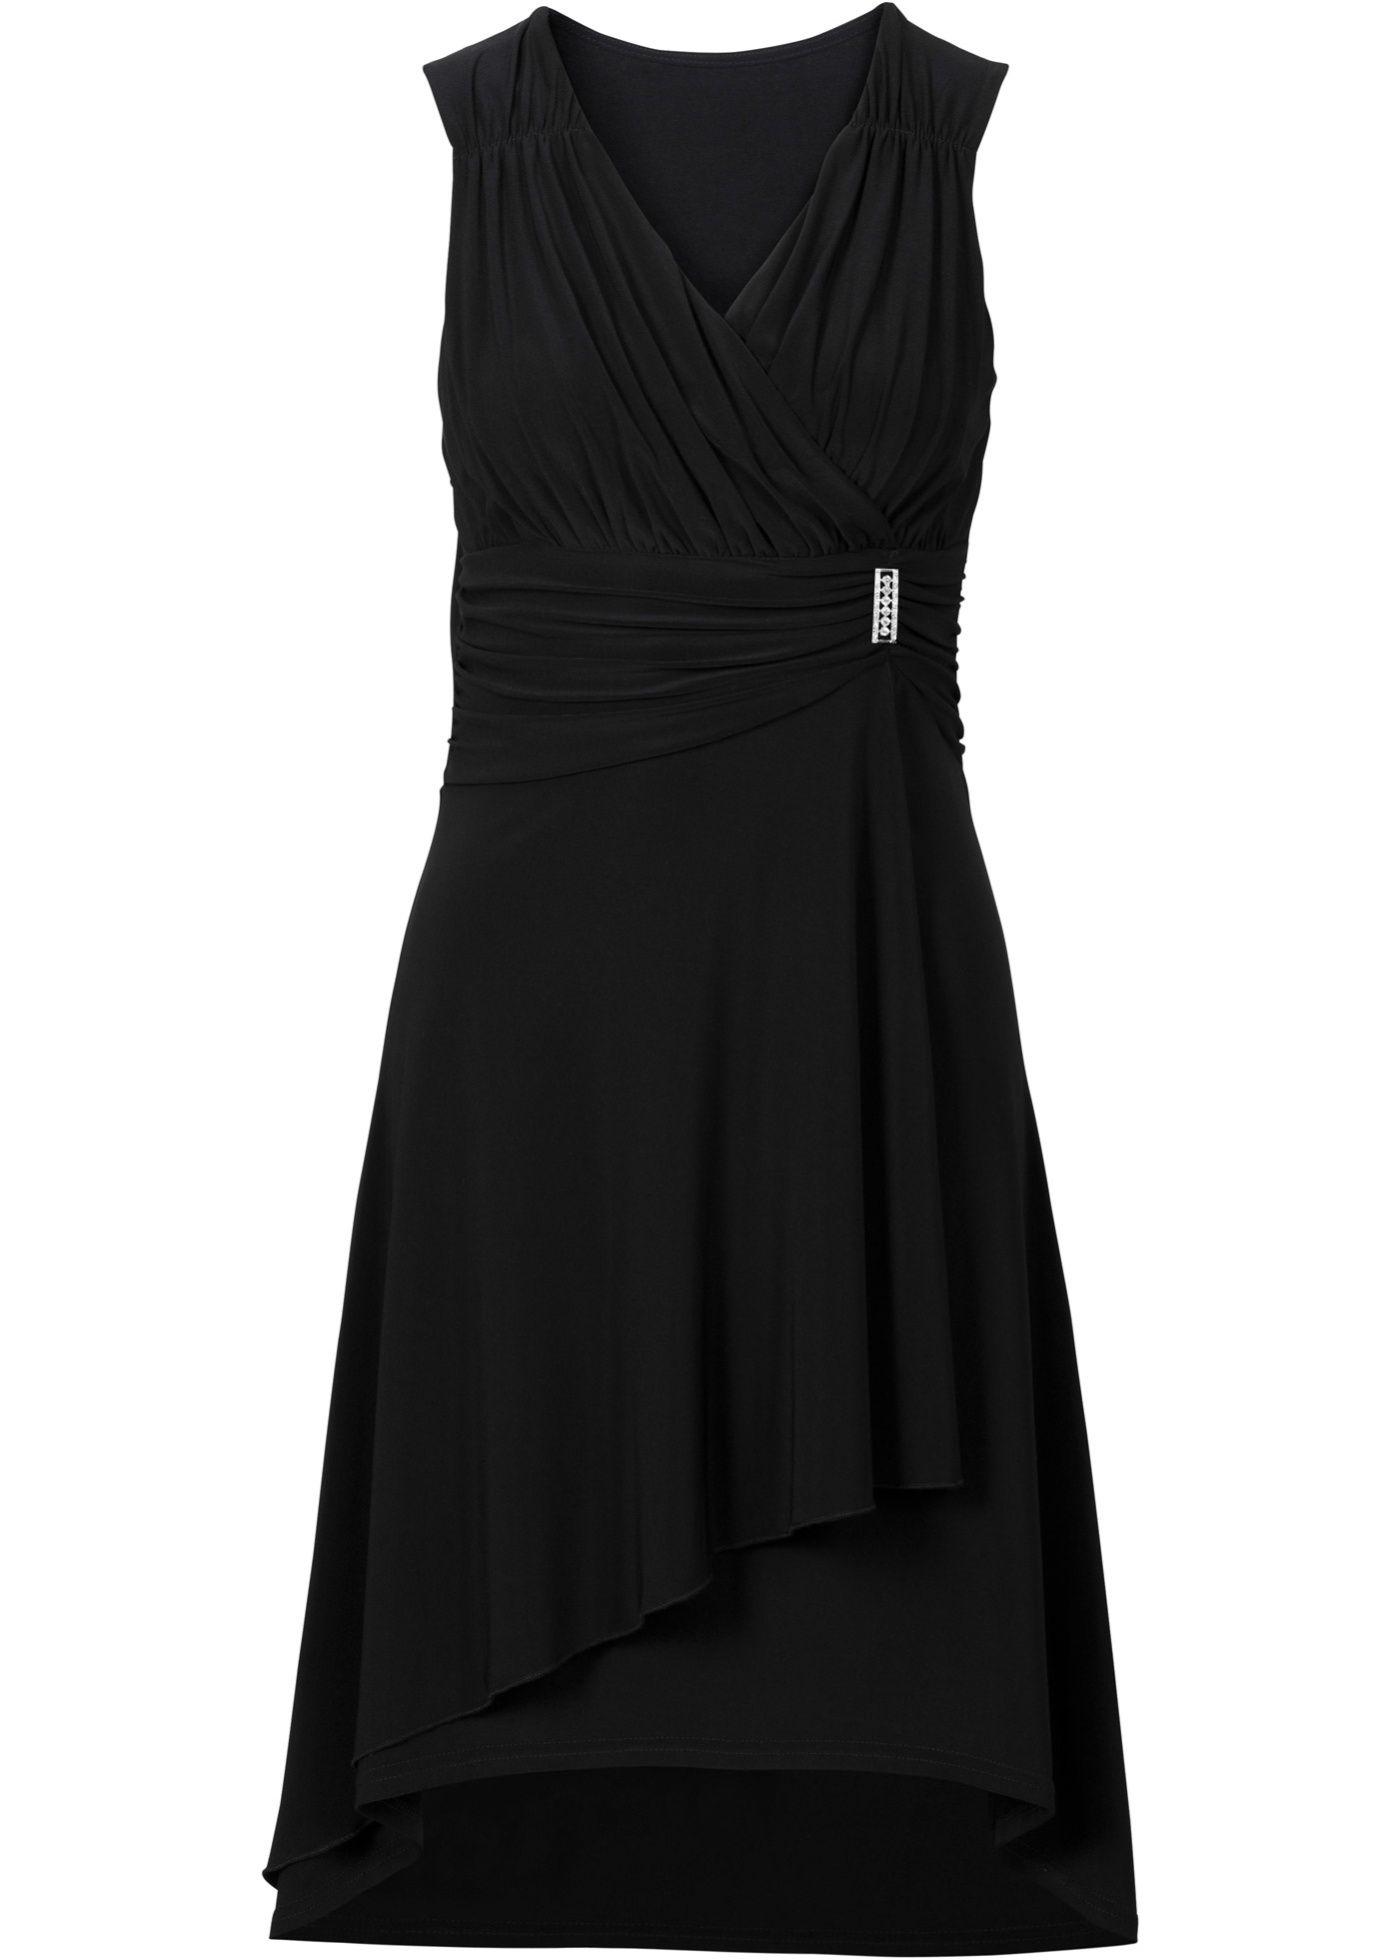 Knielanges Kleid in aufregender Wickeloptik - schwarz  Knielange